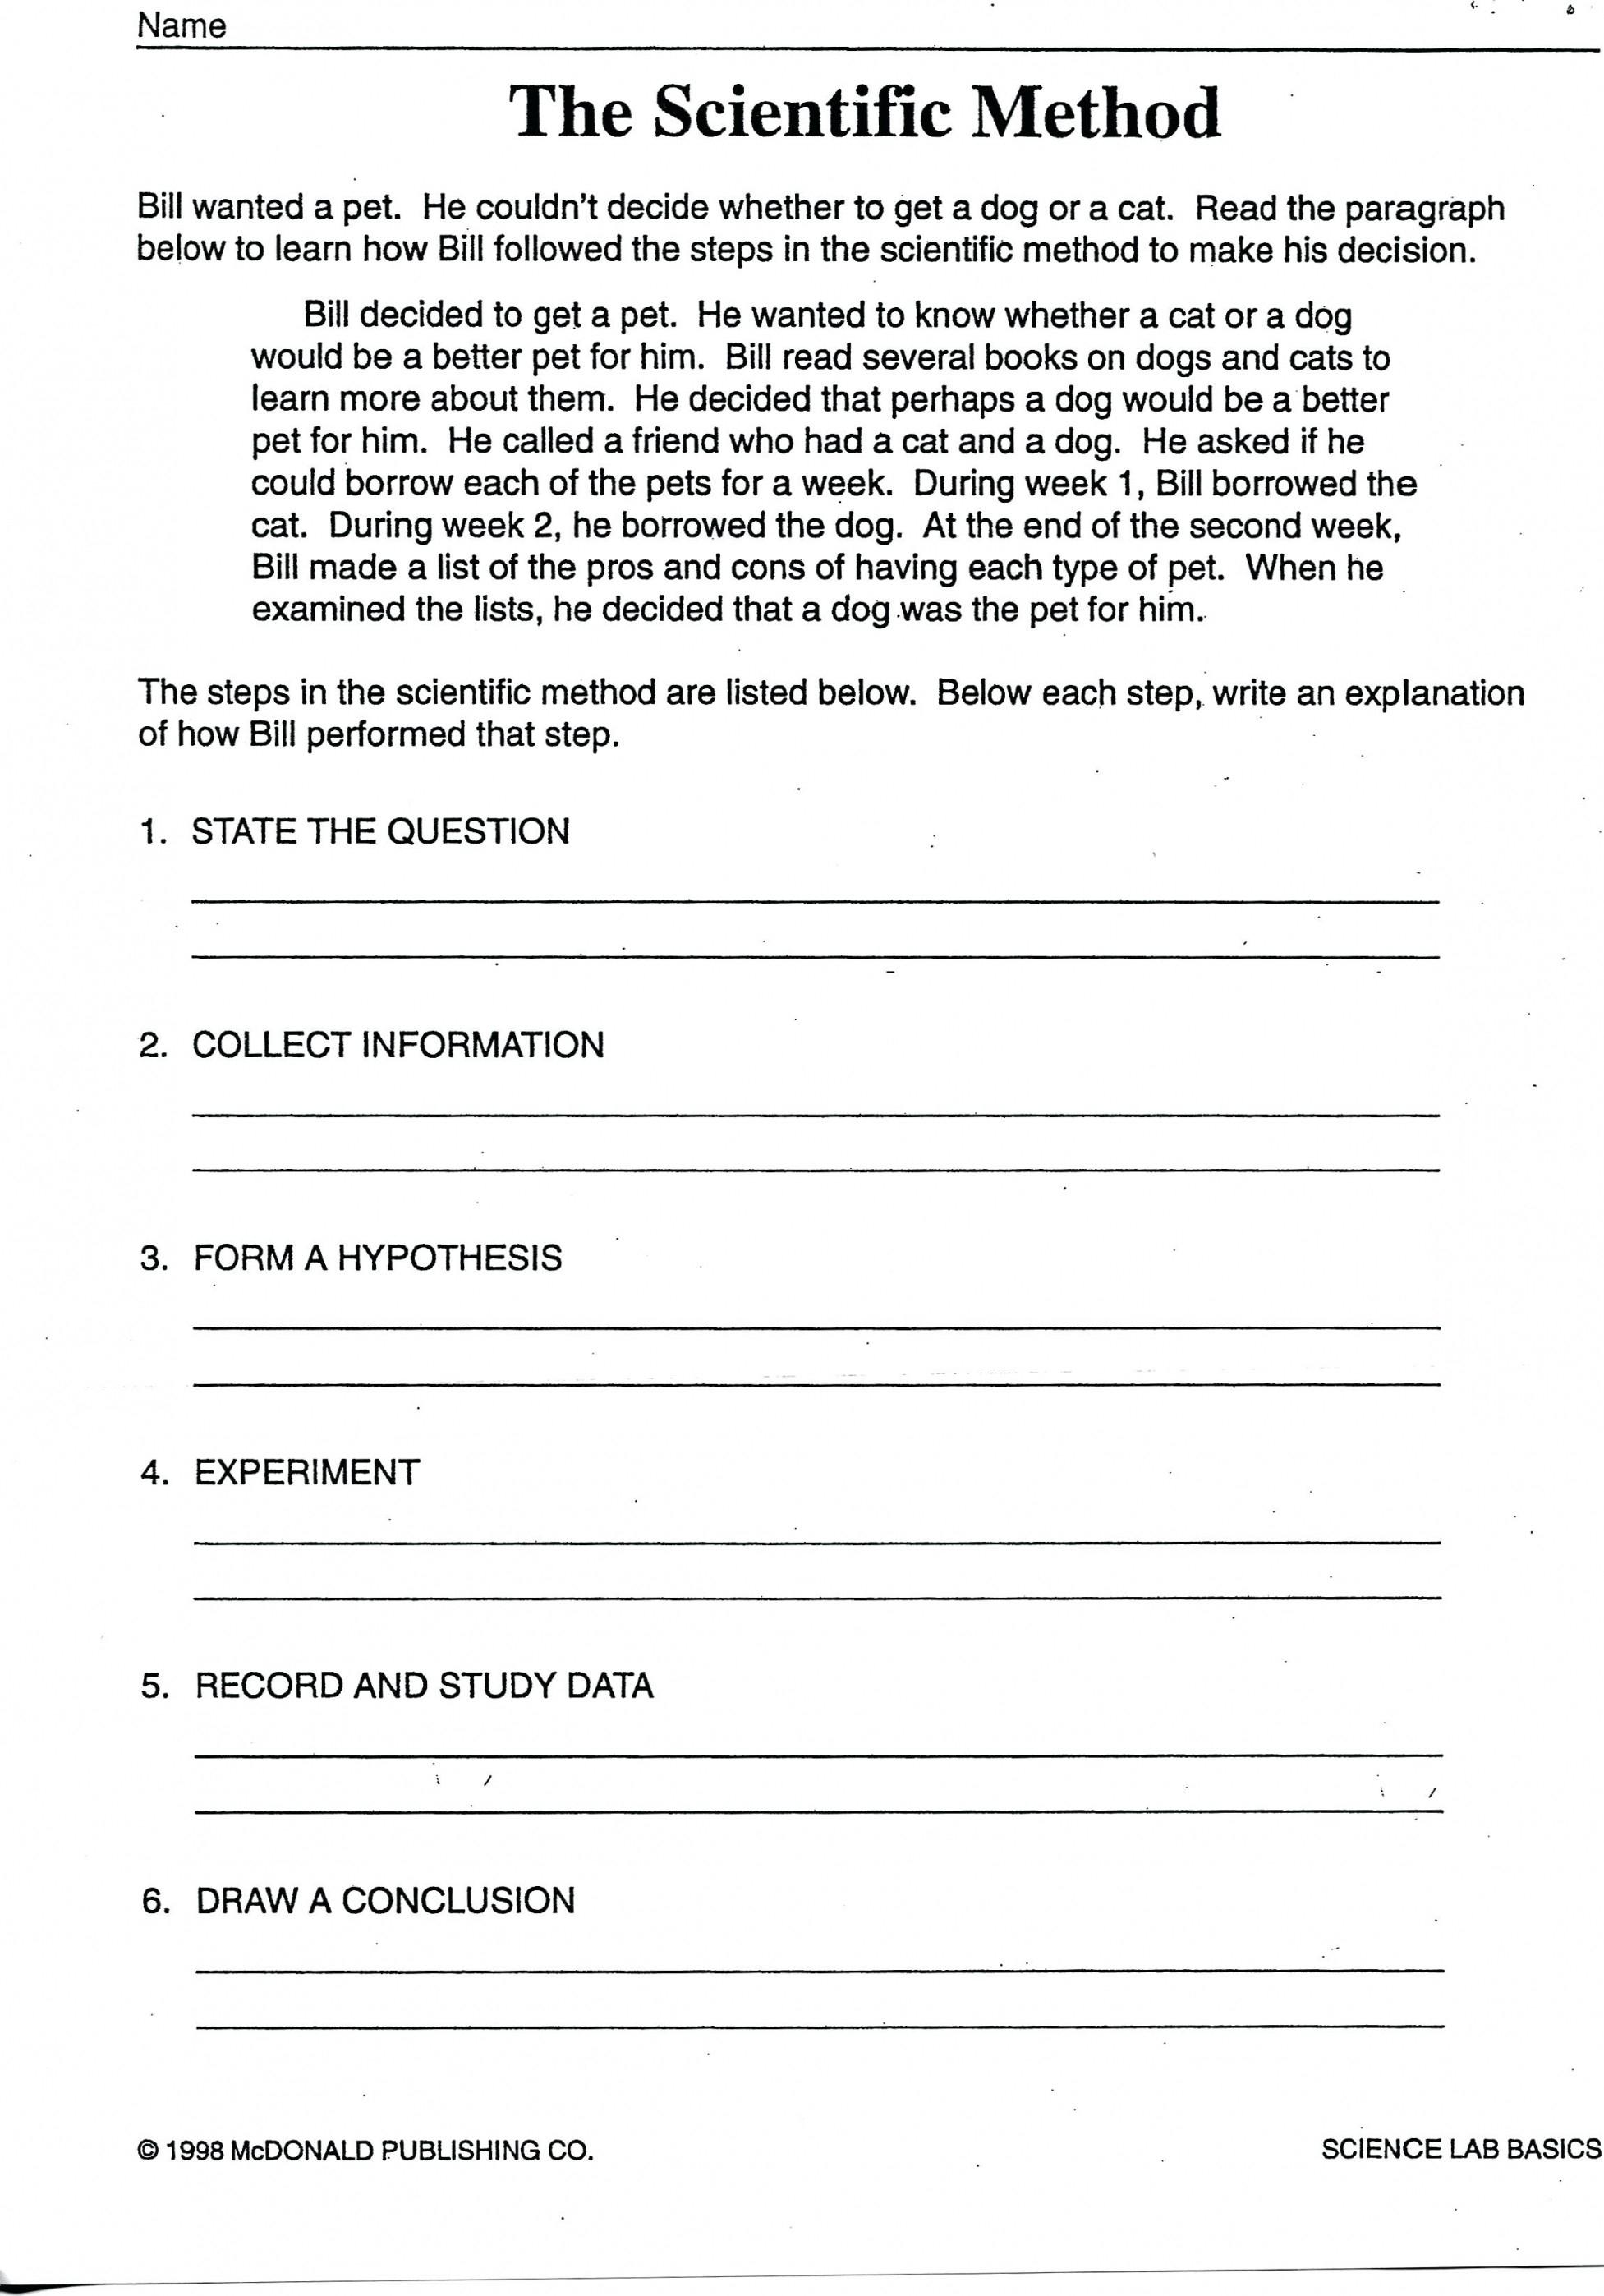 6Th Grade Math Games Printable Worksheets Word Problems Using Dice | 6Th Grade Printable Worksheets